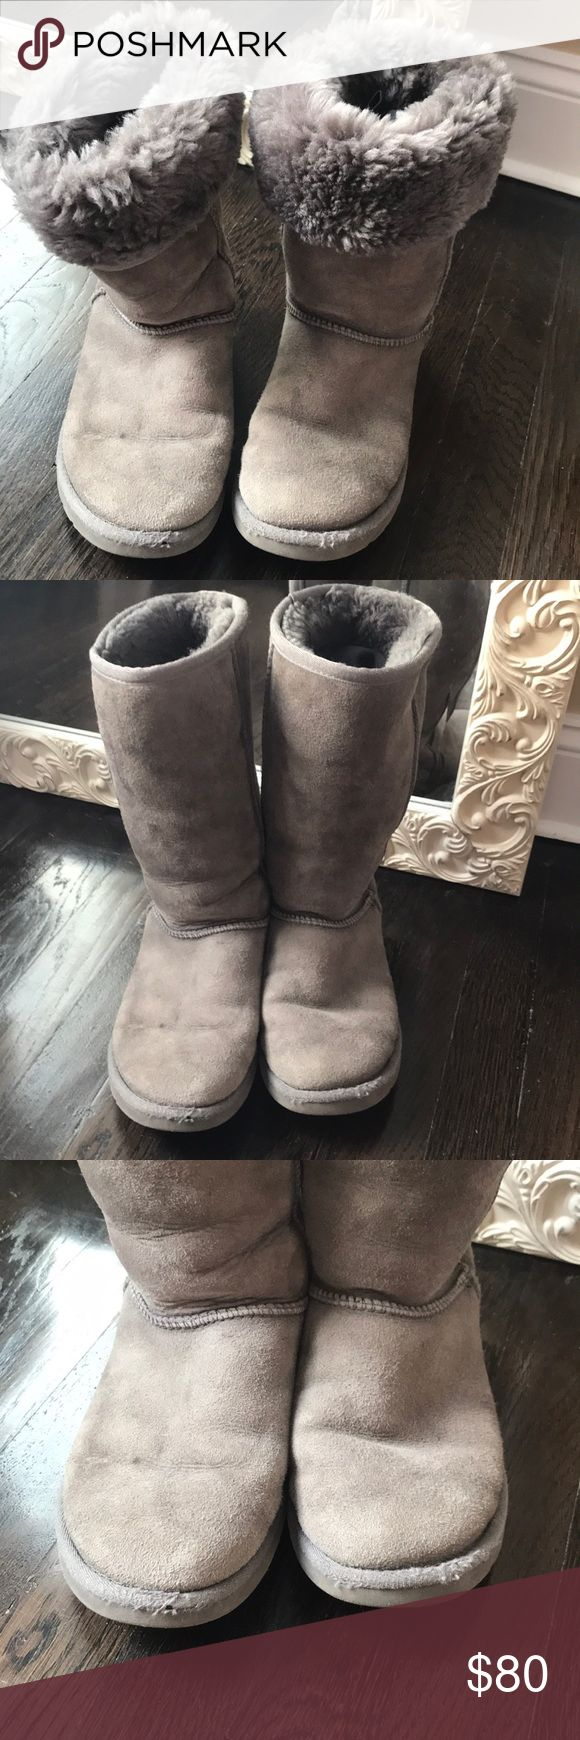 Uggs boot Original Ugg Australia tall gray boot UGG Shoes Winter & Rain Boots